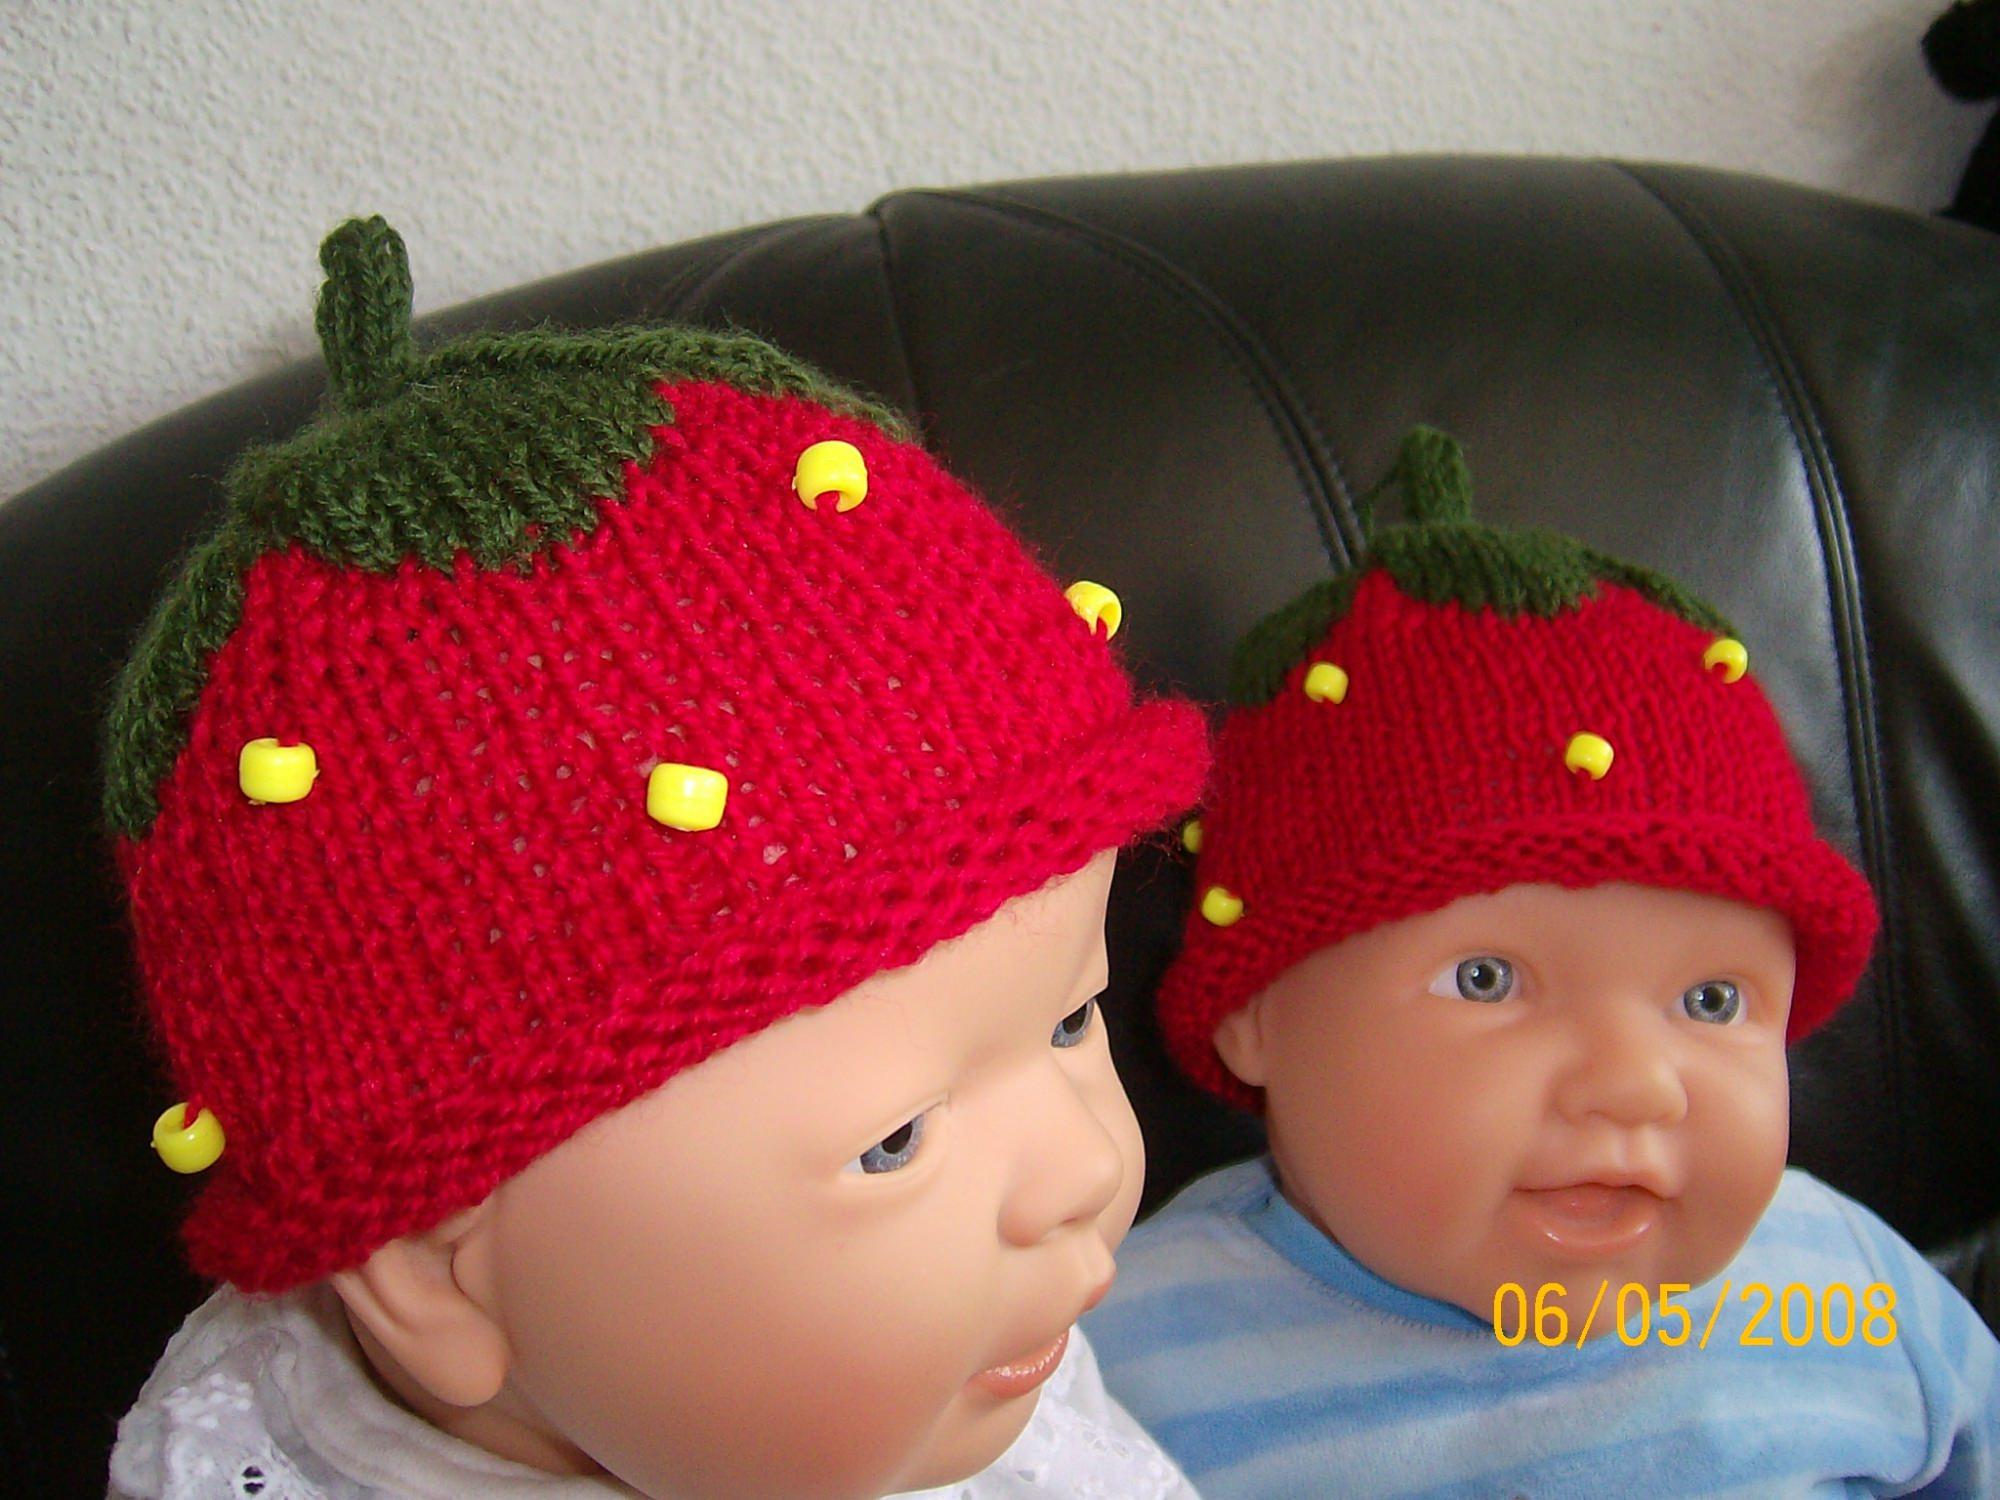 - Erdbeermütze Baby Kinder Reborn´s Puppen (38-42) - Erdbeermütze Baby Kinder Reborn´s Puppen (38-42)